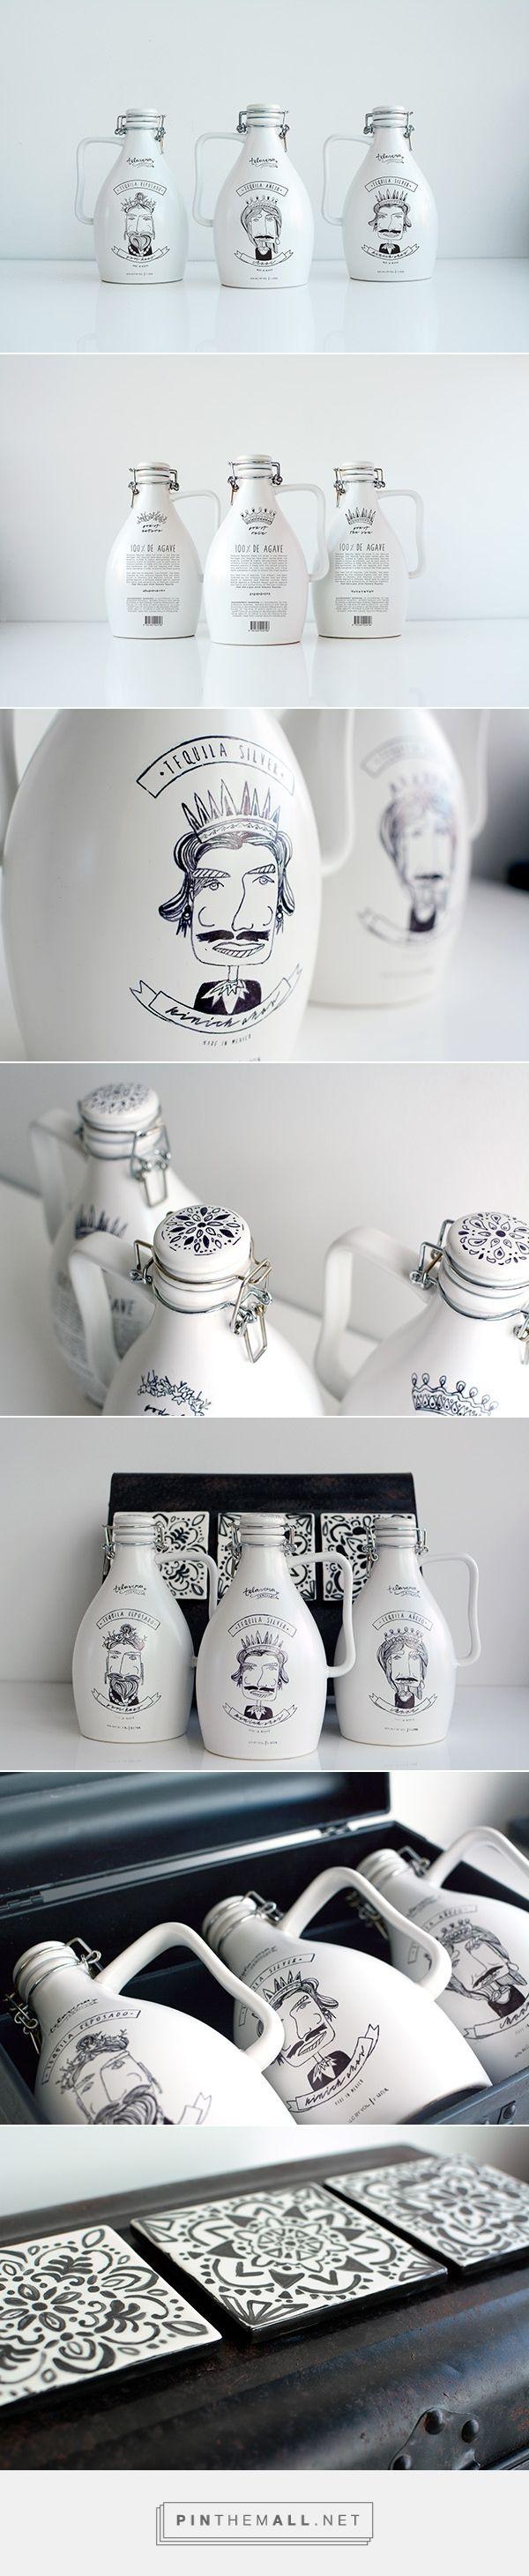 best diseño de empaque images on pinterest packaging design